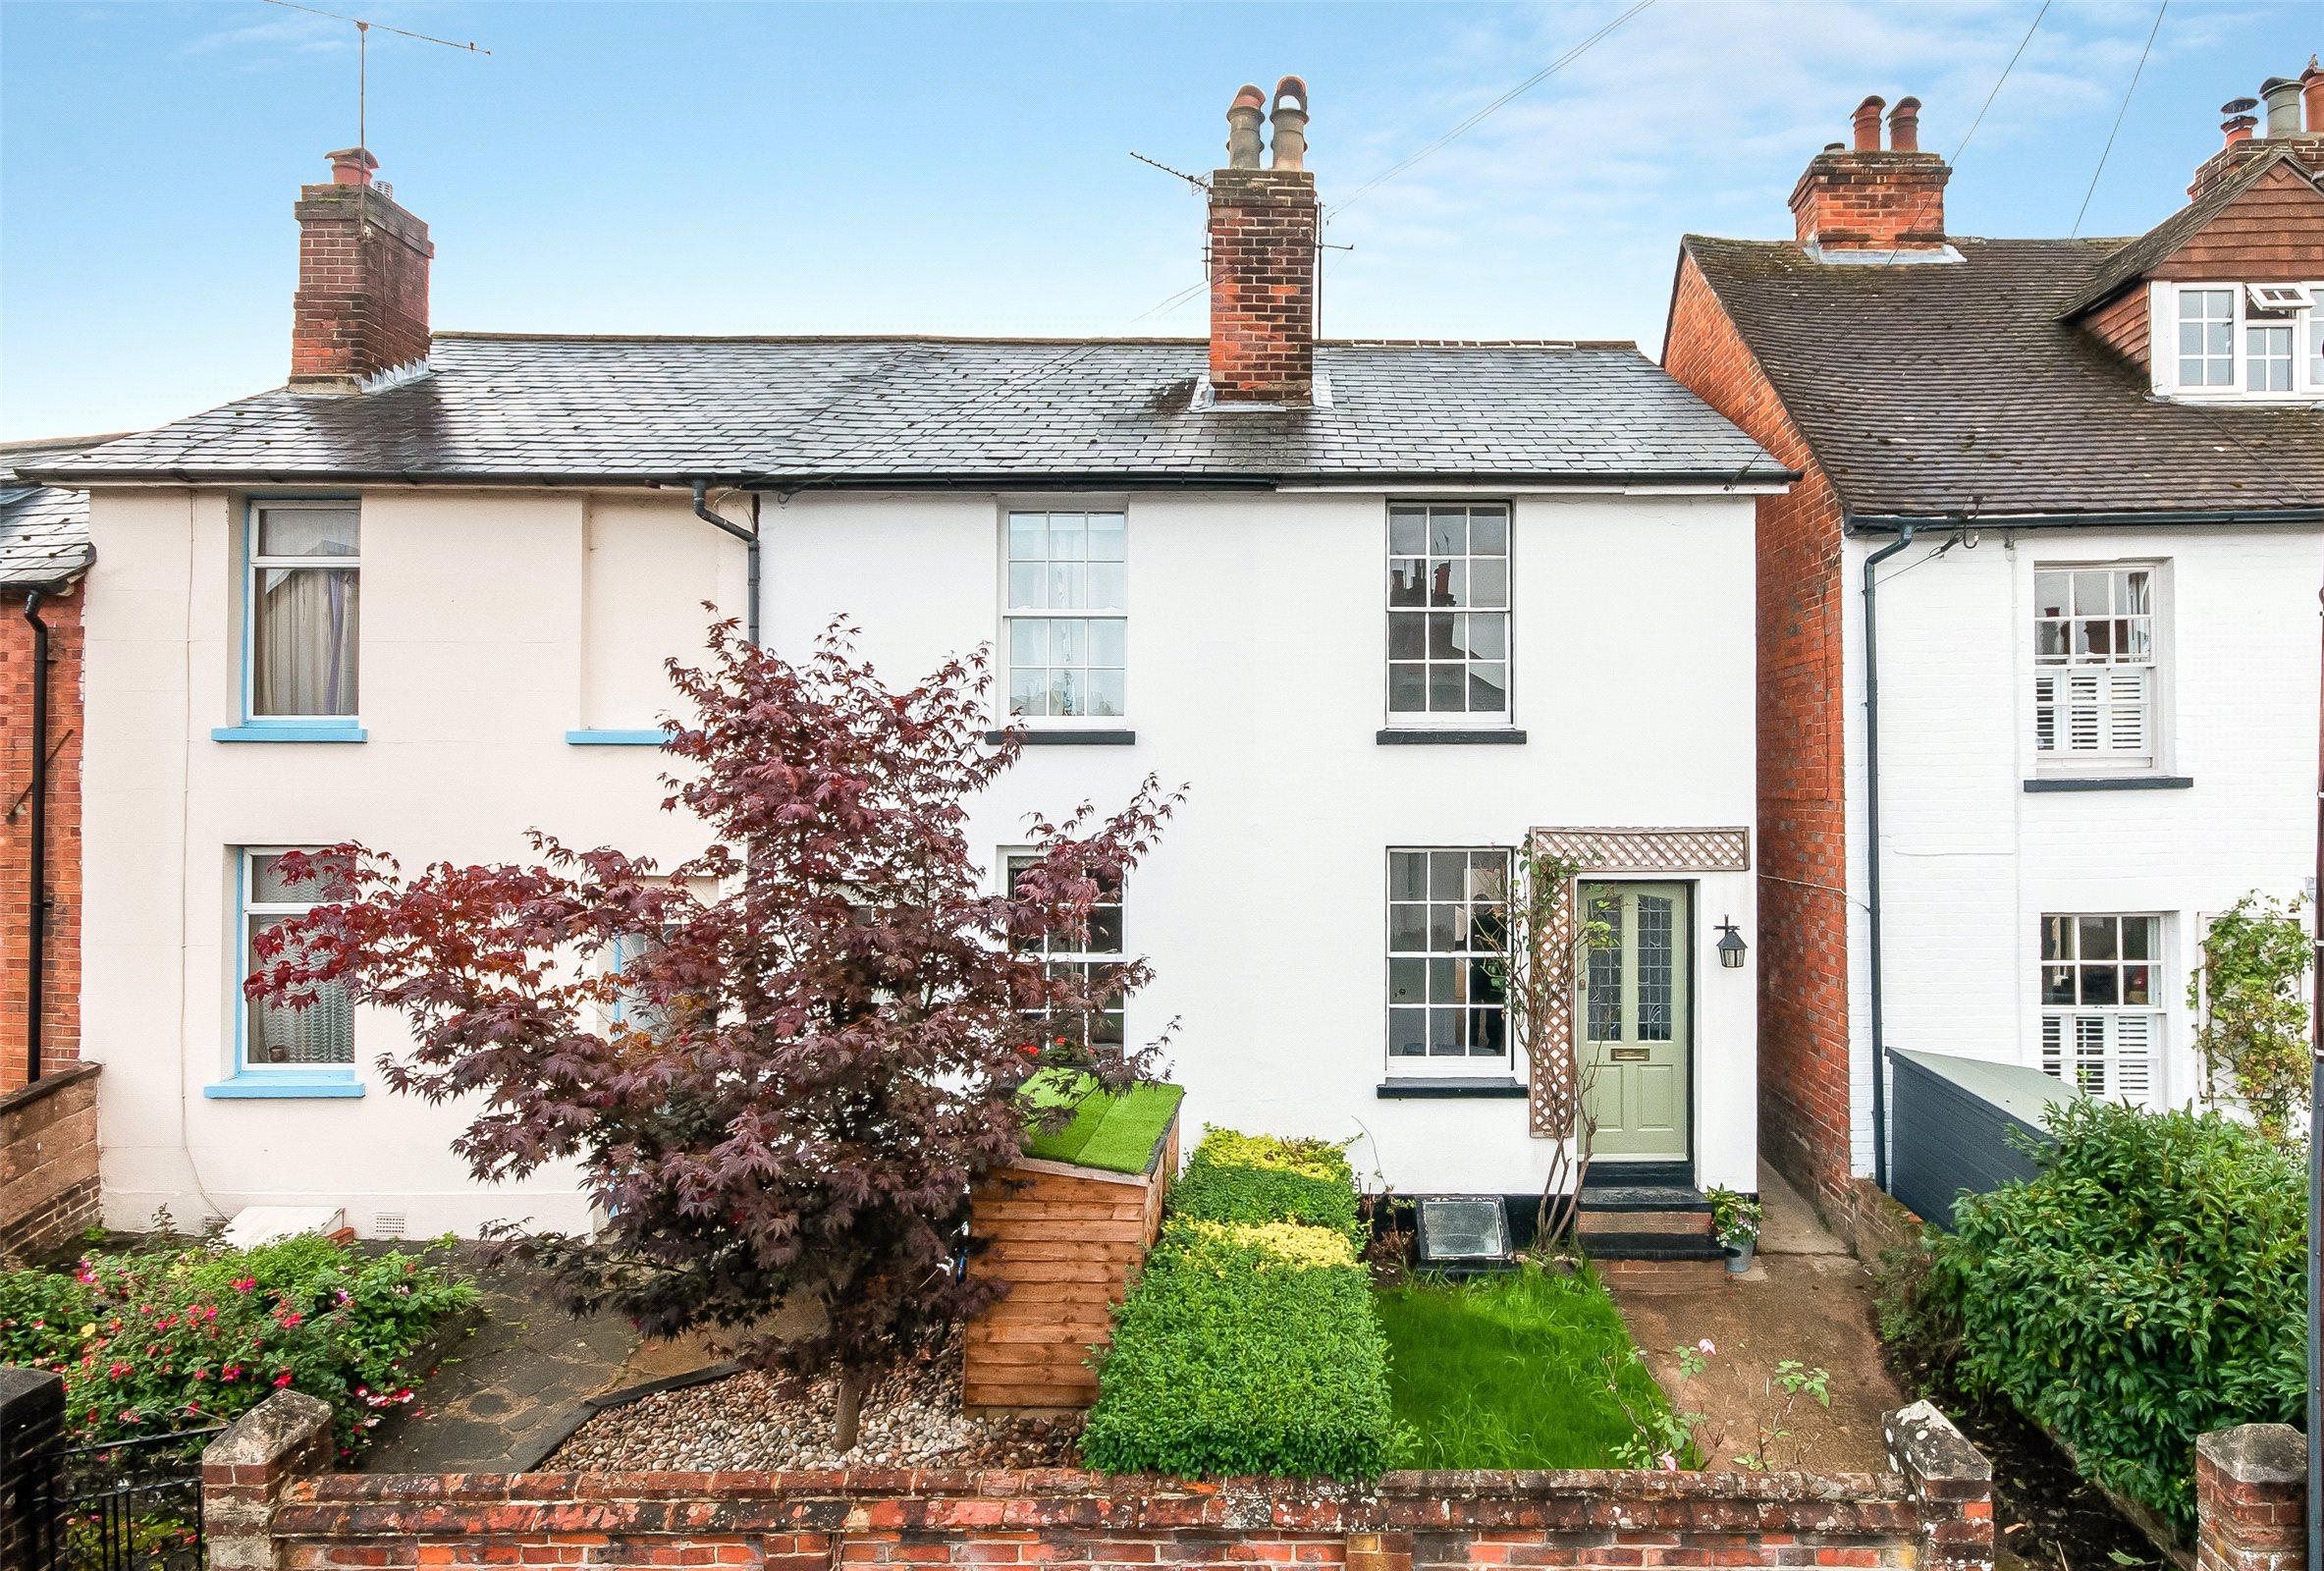 2 Bedrooms House for sale in Arundel Road, Dorking, Surrey, RH4